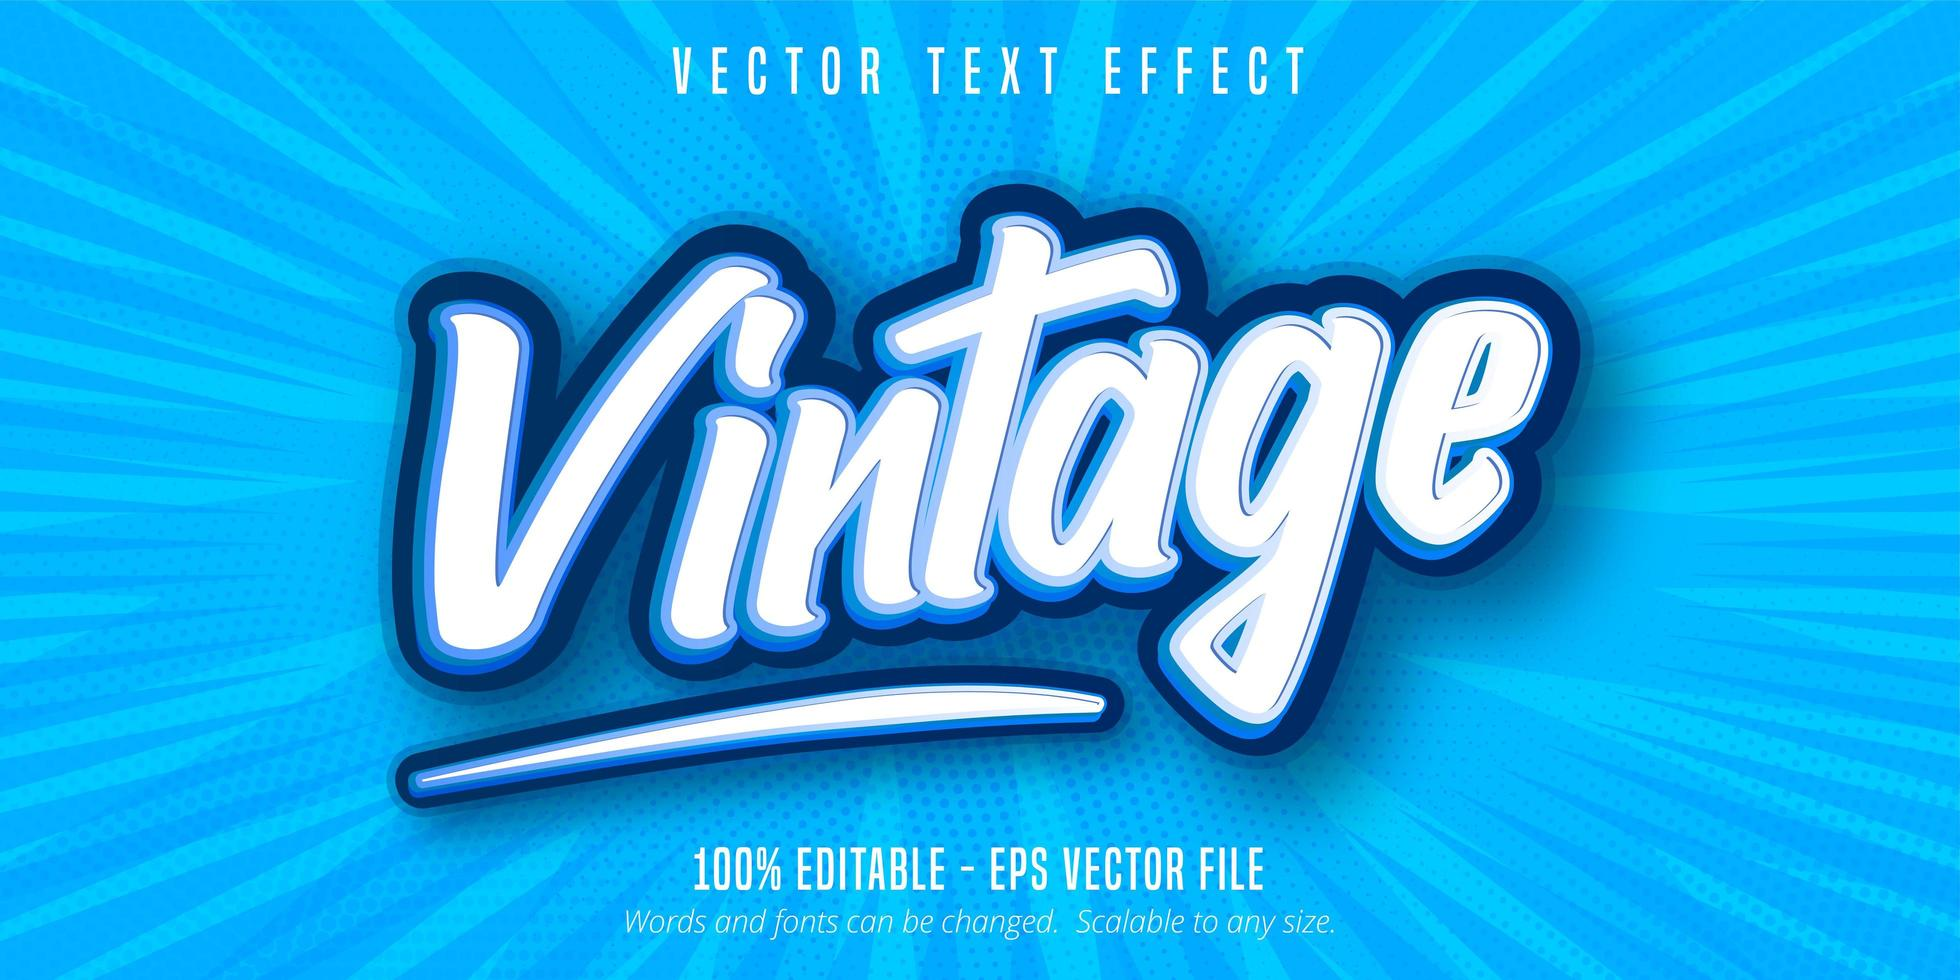 vintage text, pop art stil text effekt vektor